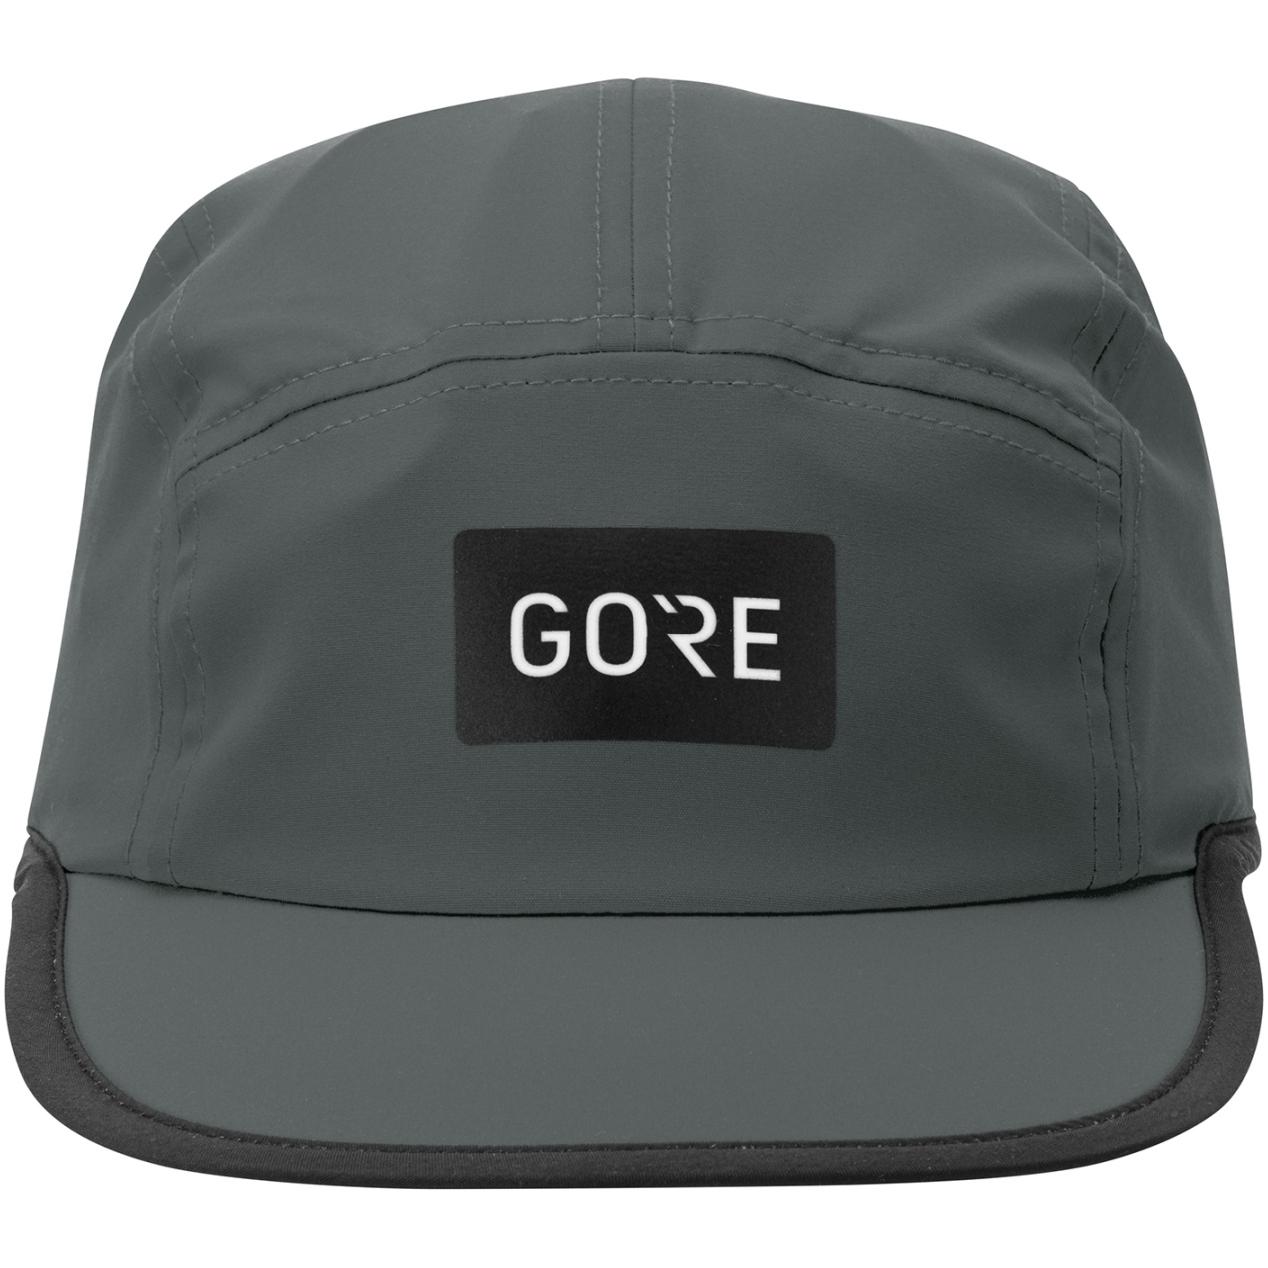 GORE Wear ID Cap - lab gray/black BF99